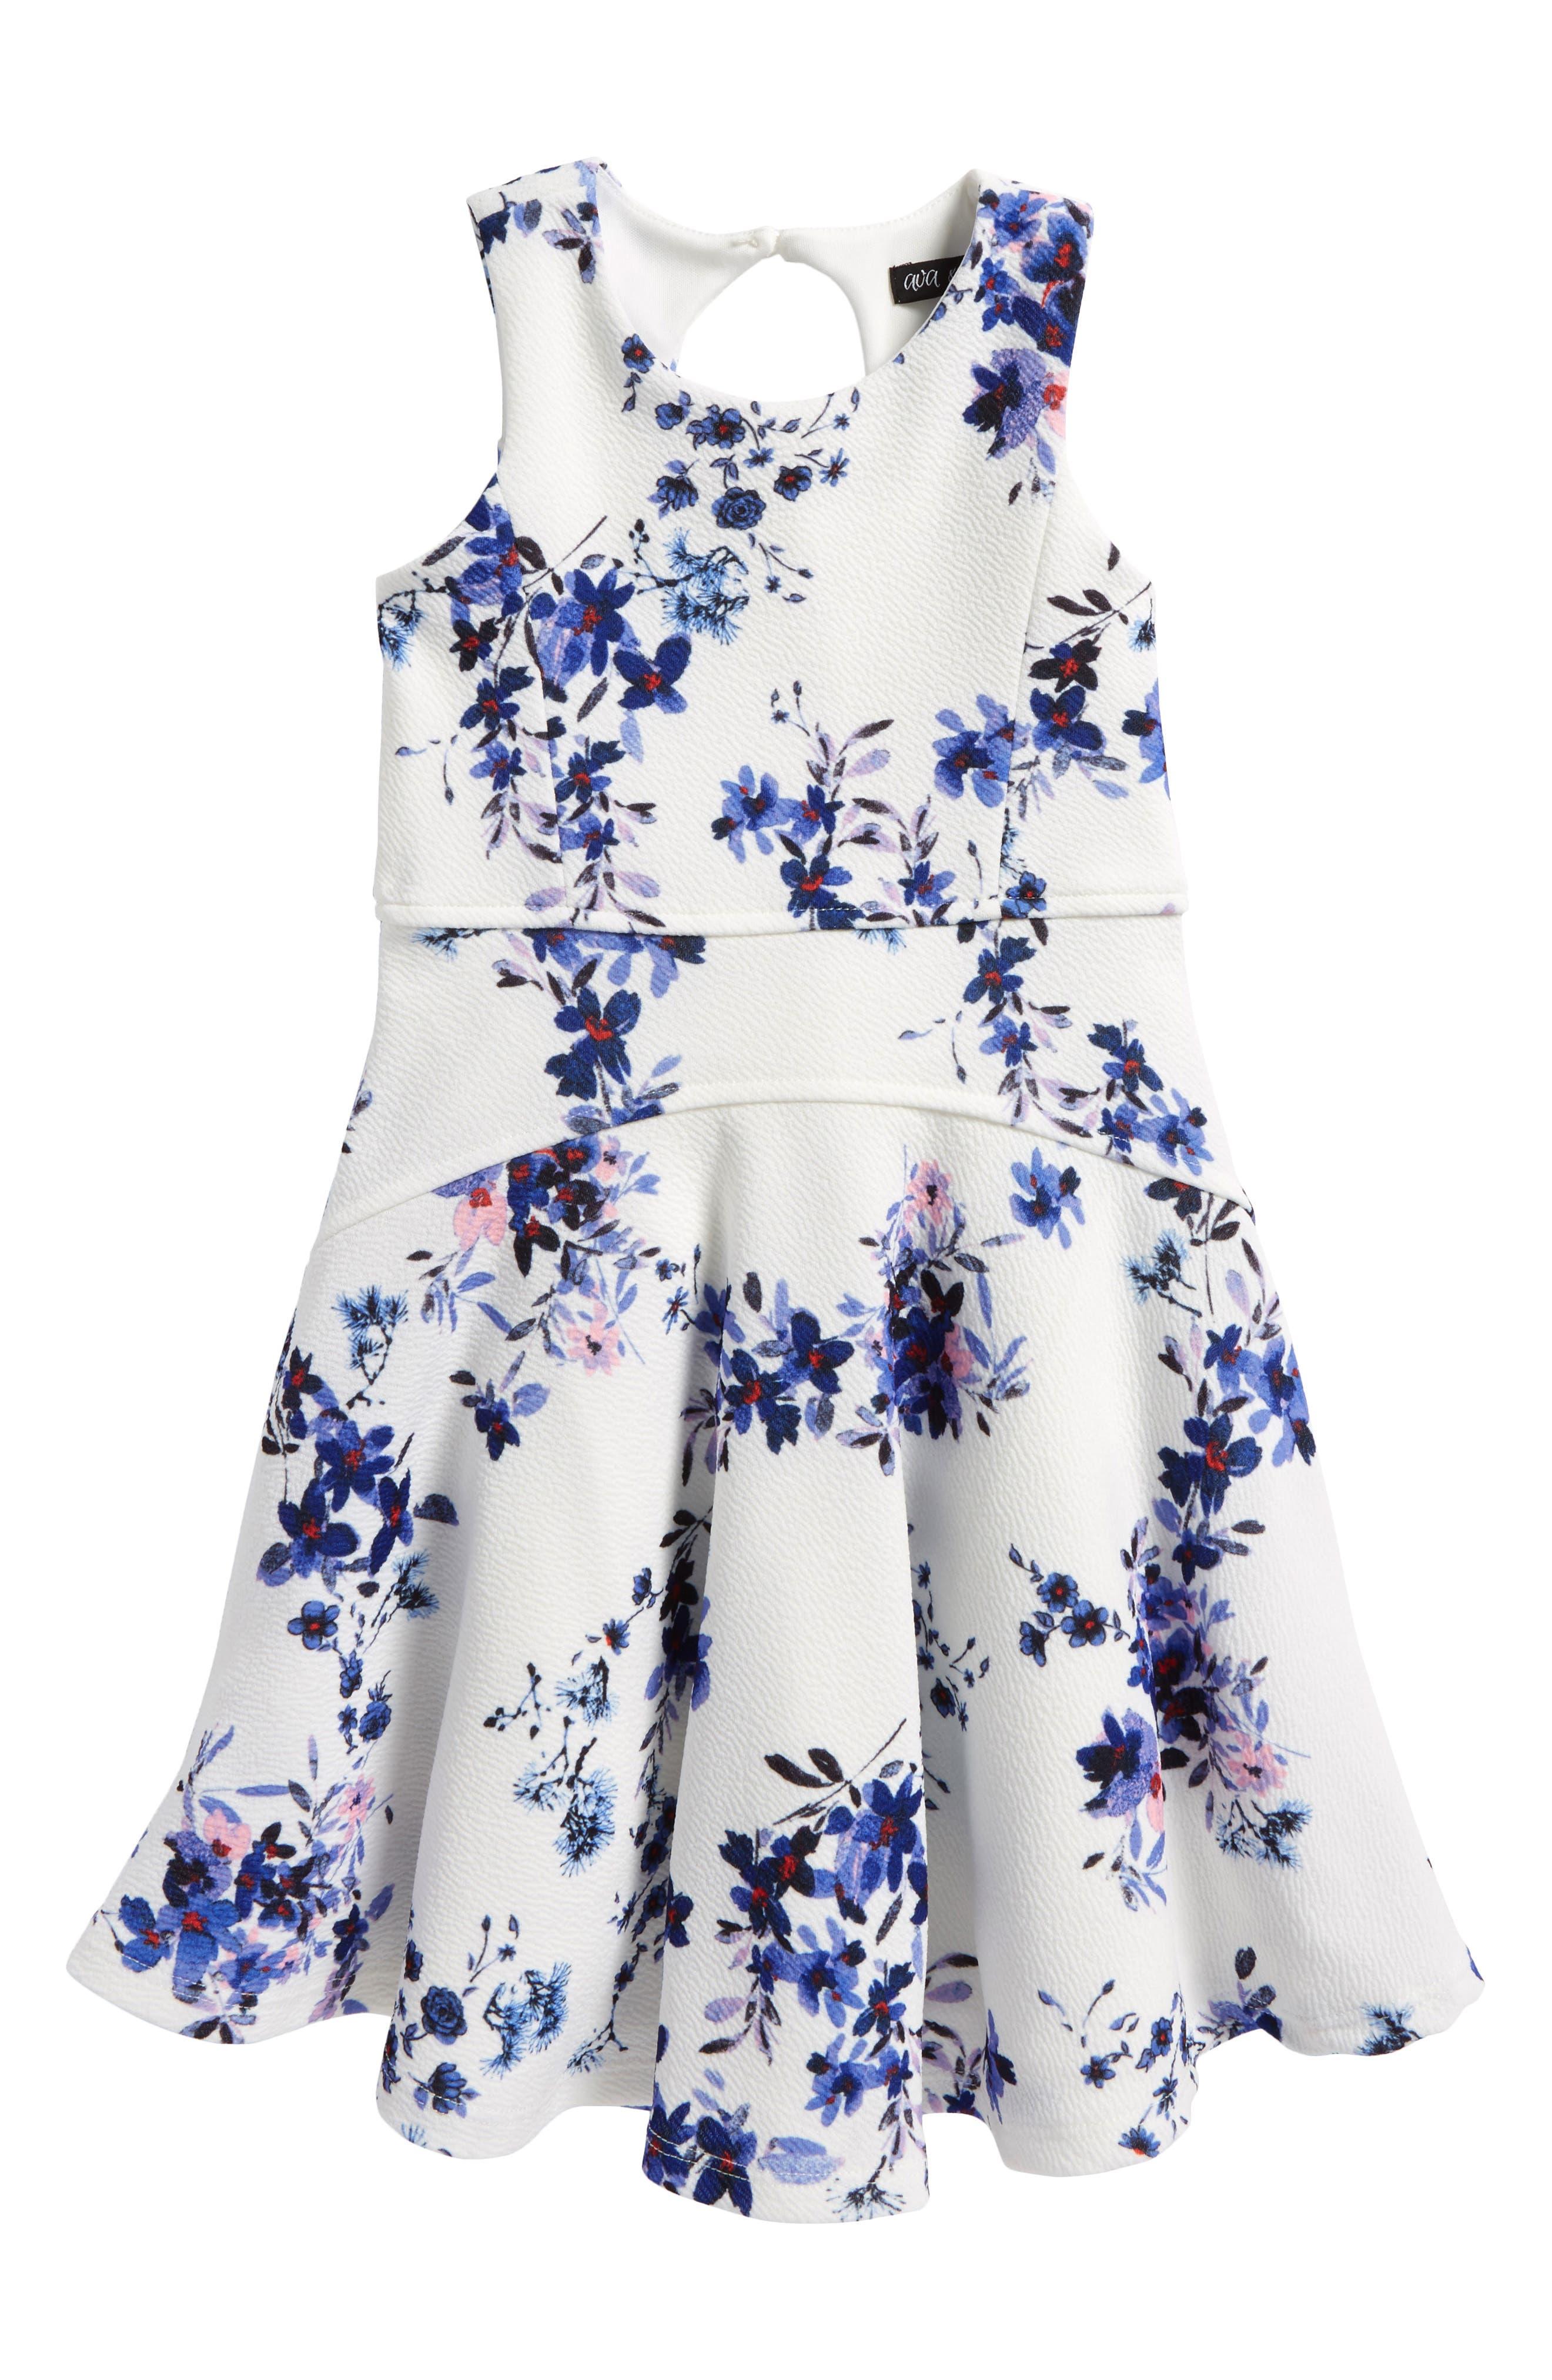 Floral Print Skater Dress,                             Main thumbnail 1, color,                             111